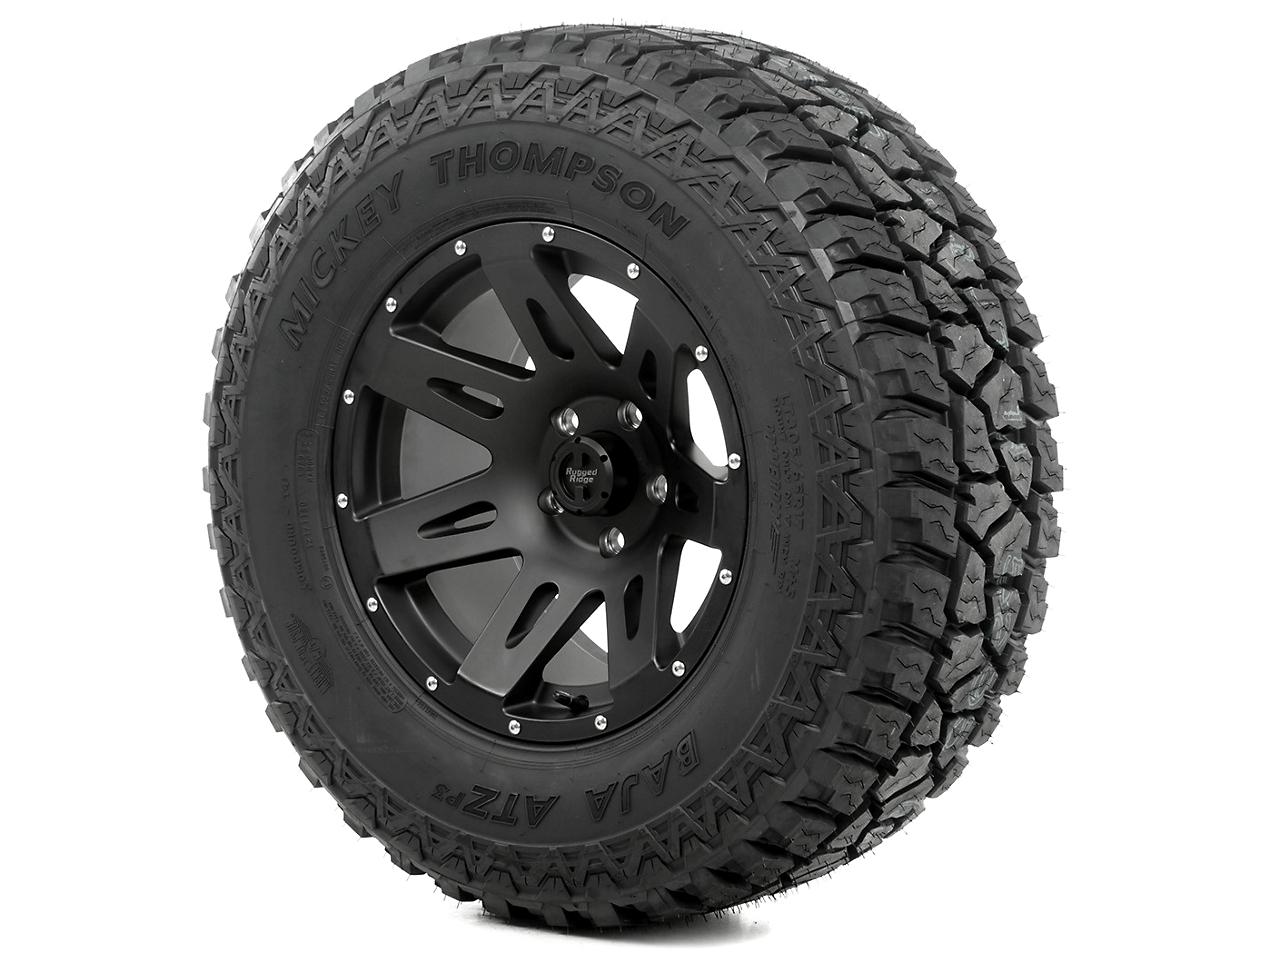 Rugged Ridge XHD Wheel 18x9 Black Satin and Mickey Thompson ATZ P3 305/60R18 Wheel - Tire Kit (07-12 Jeep Wrangler JK)